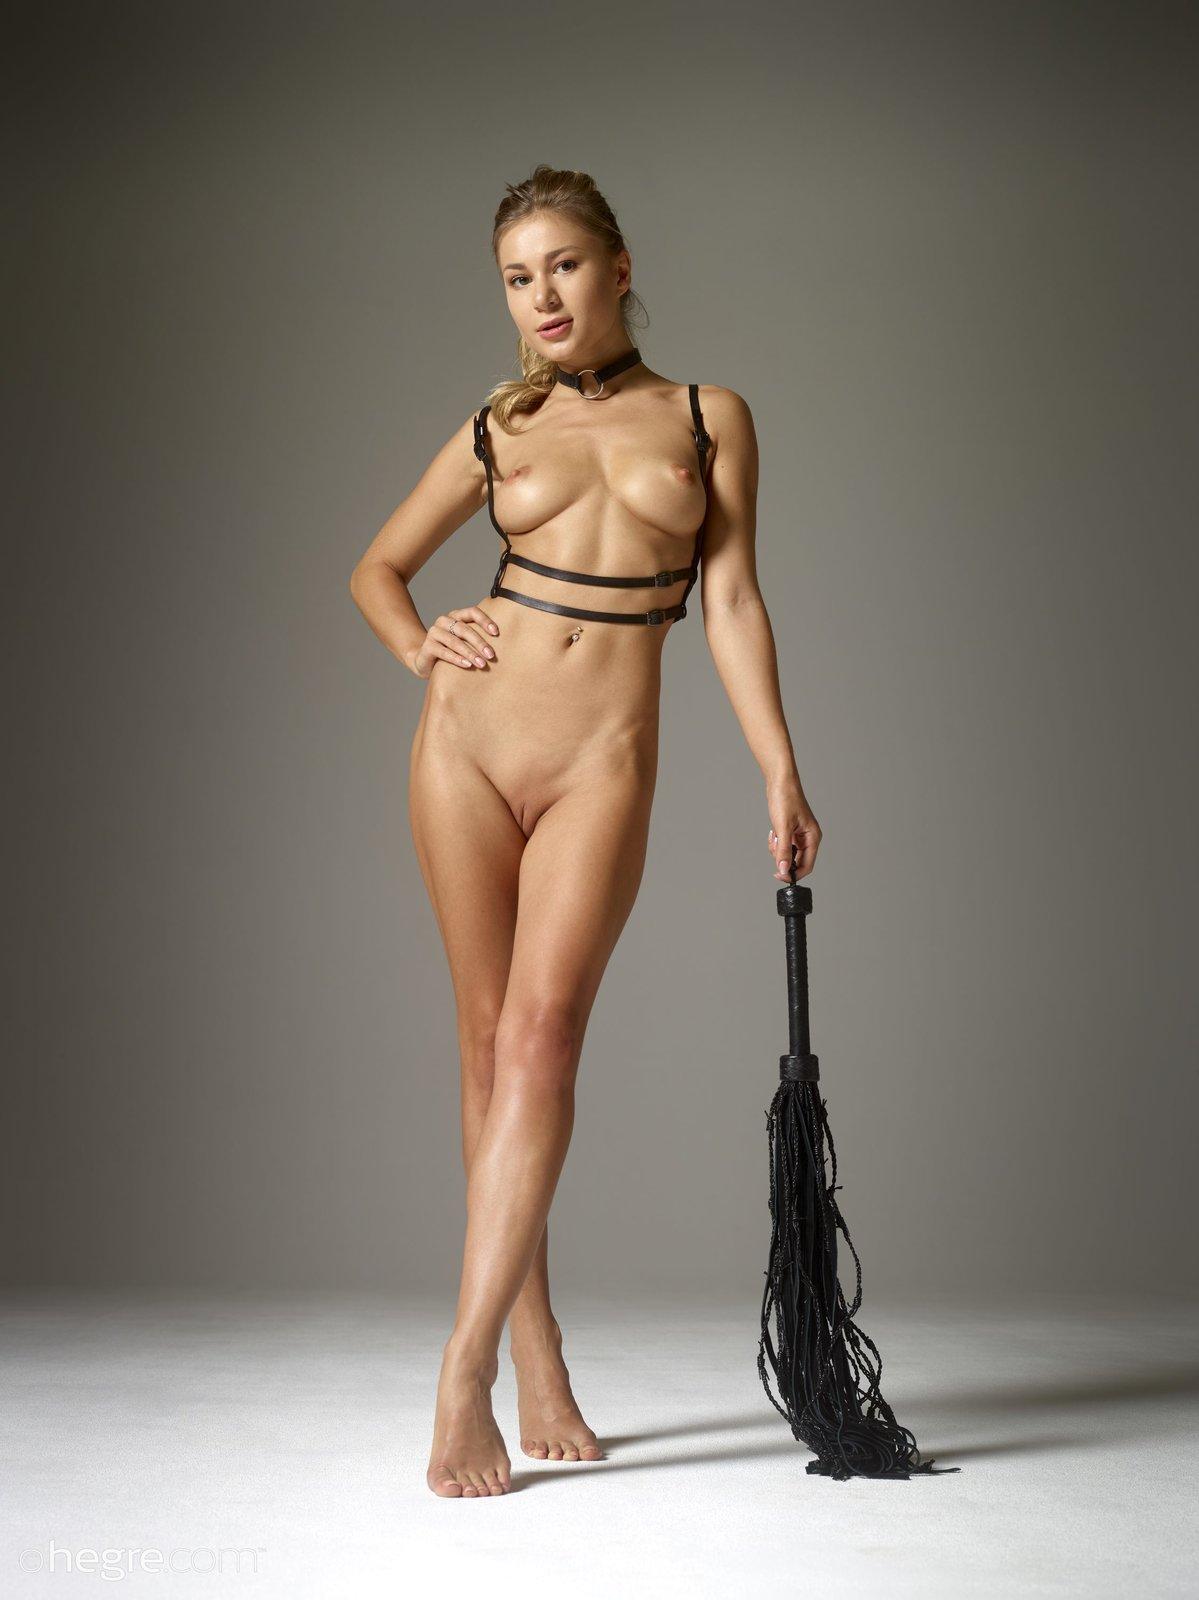 Darina L In Domina By Hegre-Art 12 Photos  Erotic Beauties-1525